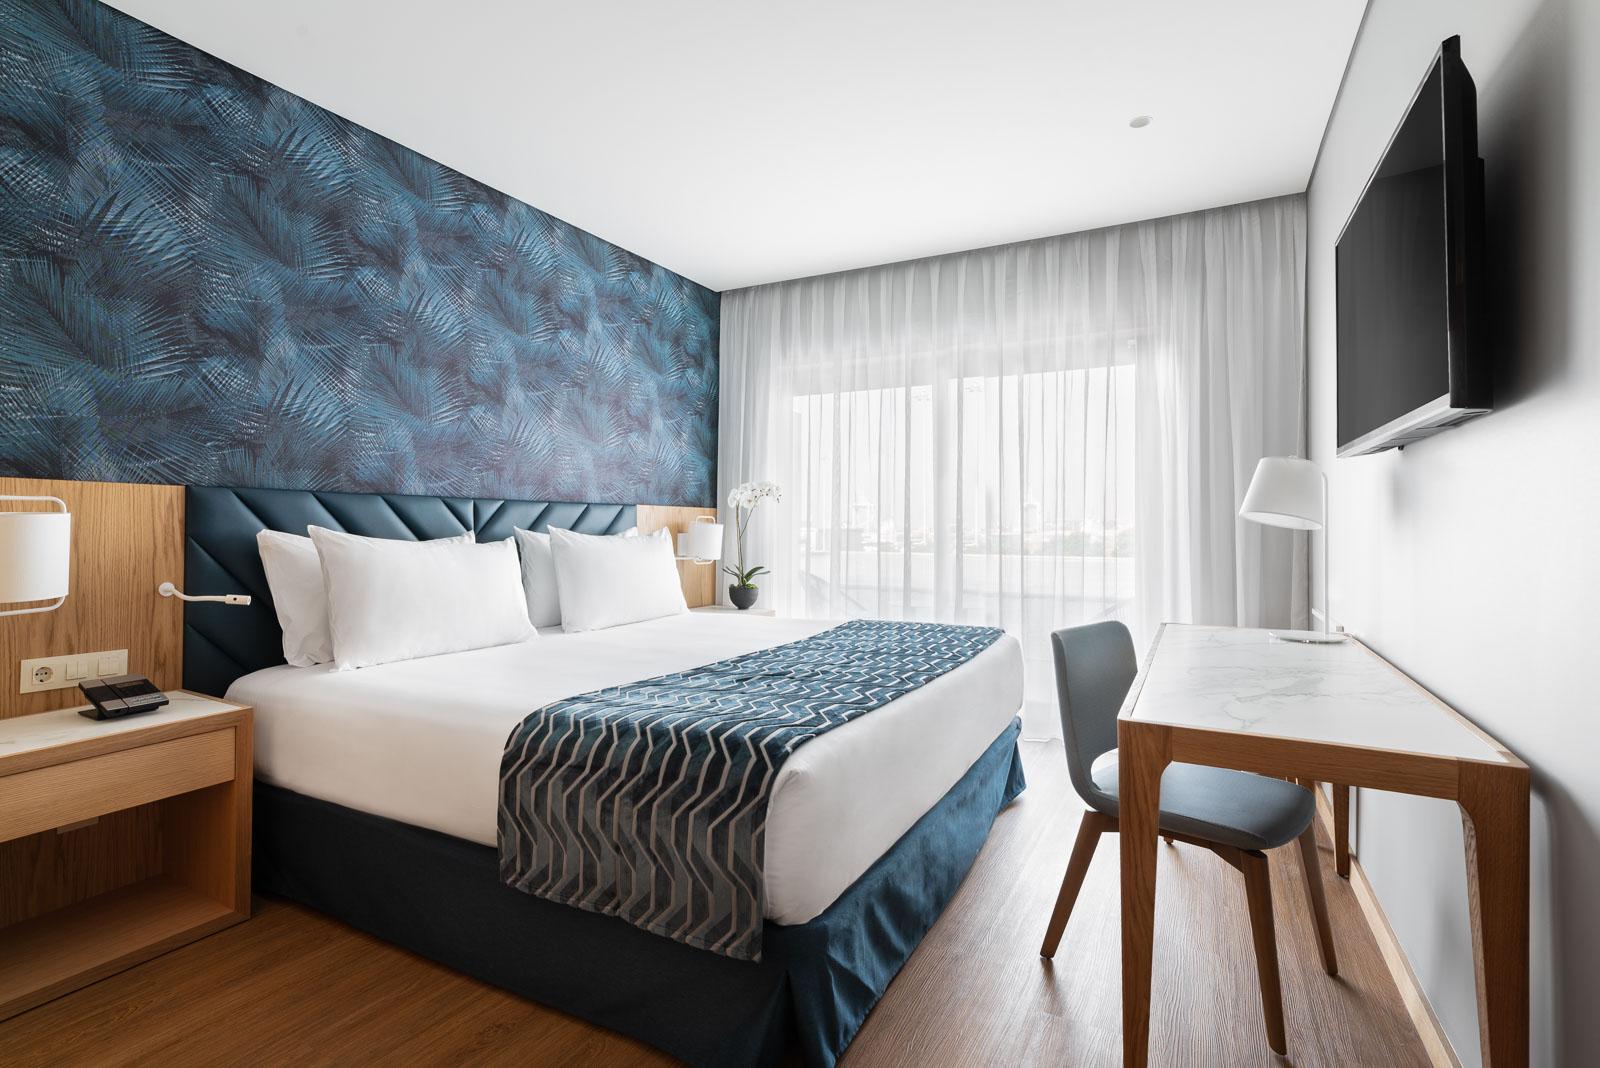 fotografía profesional de hoteles